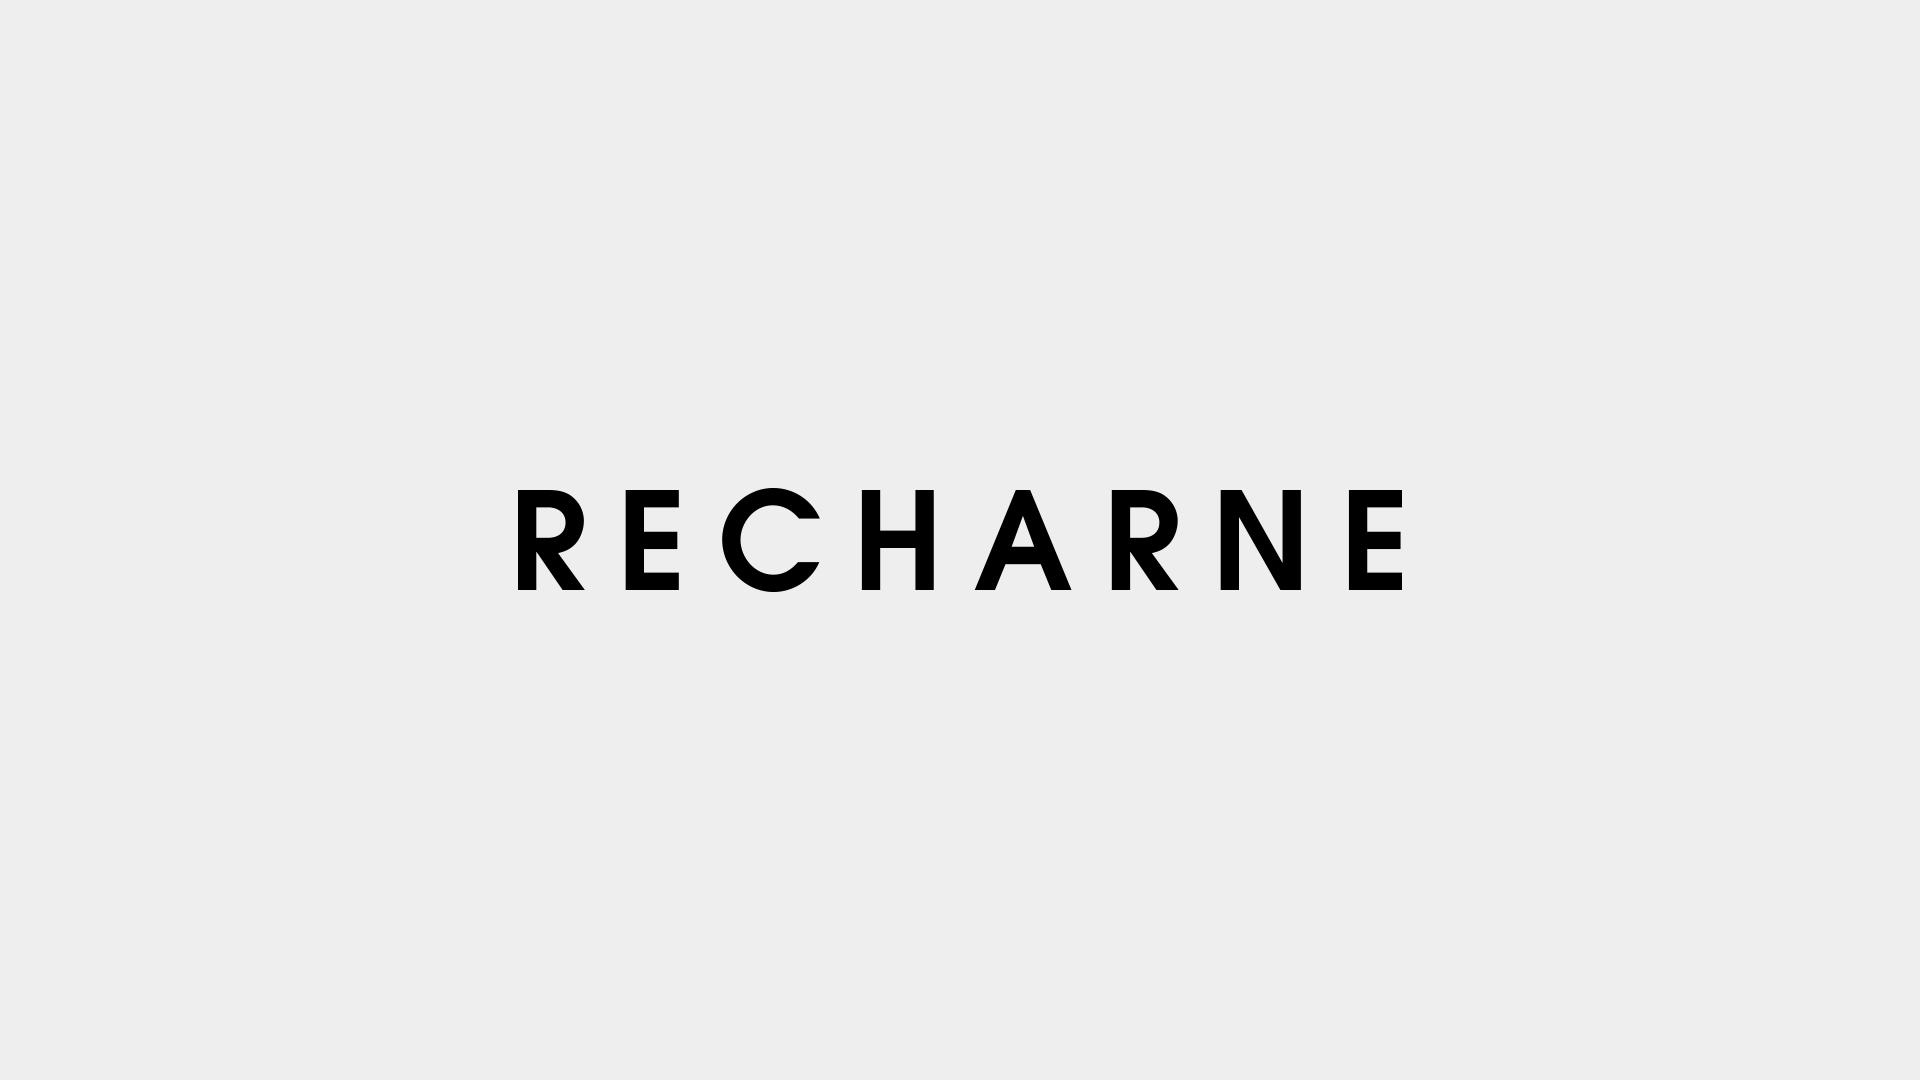 【RECHARNE(リシャルネ)】【missRECHARNE(ミスリシャルネ)】に感謝!!